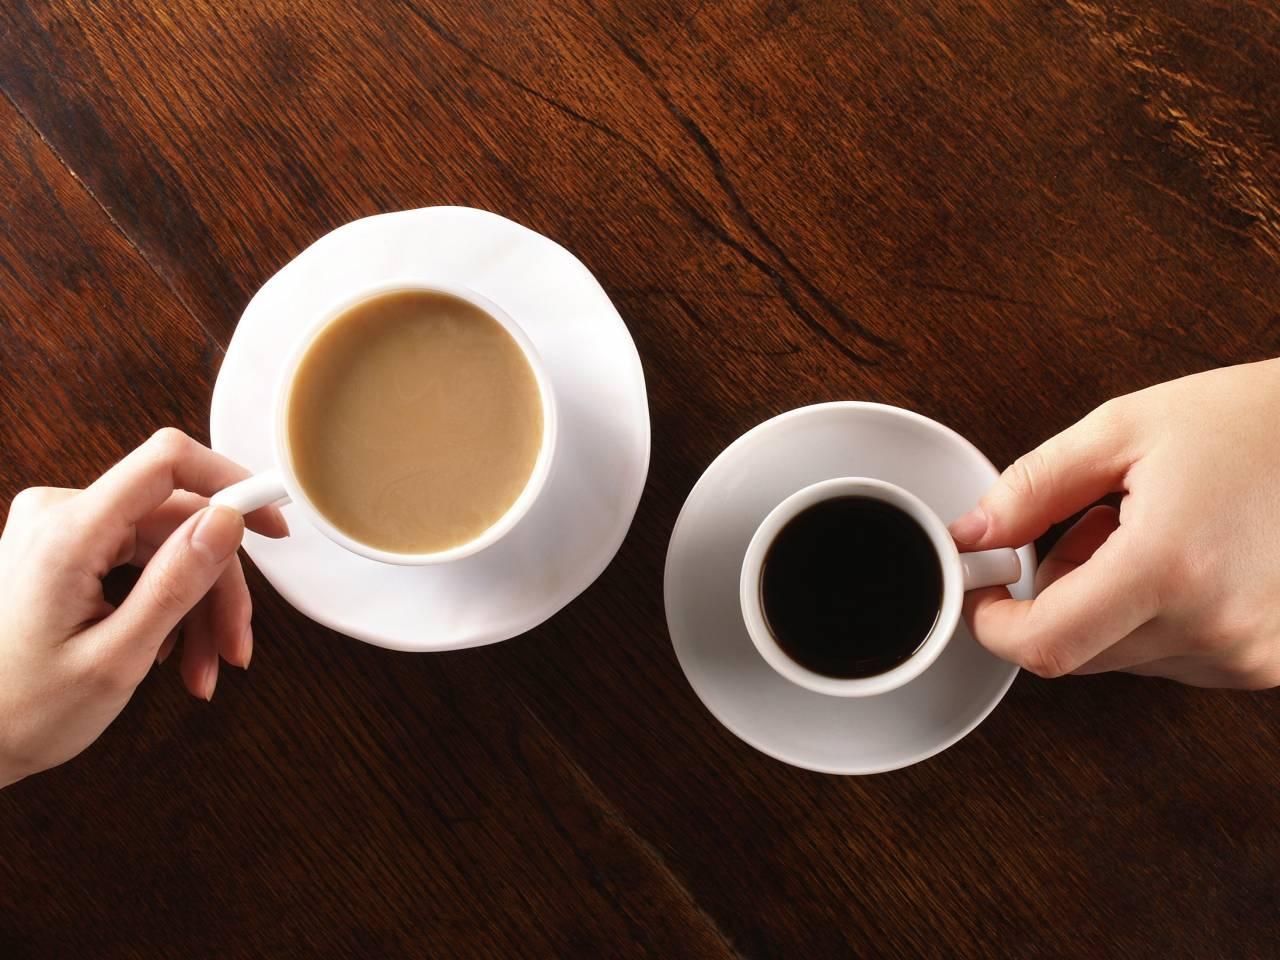 coffee-vs-tea-romantic-ideas-with-drinks